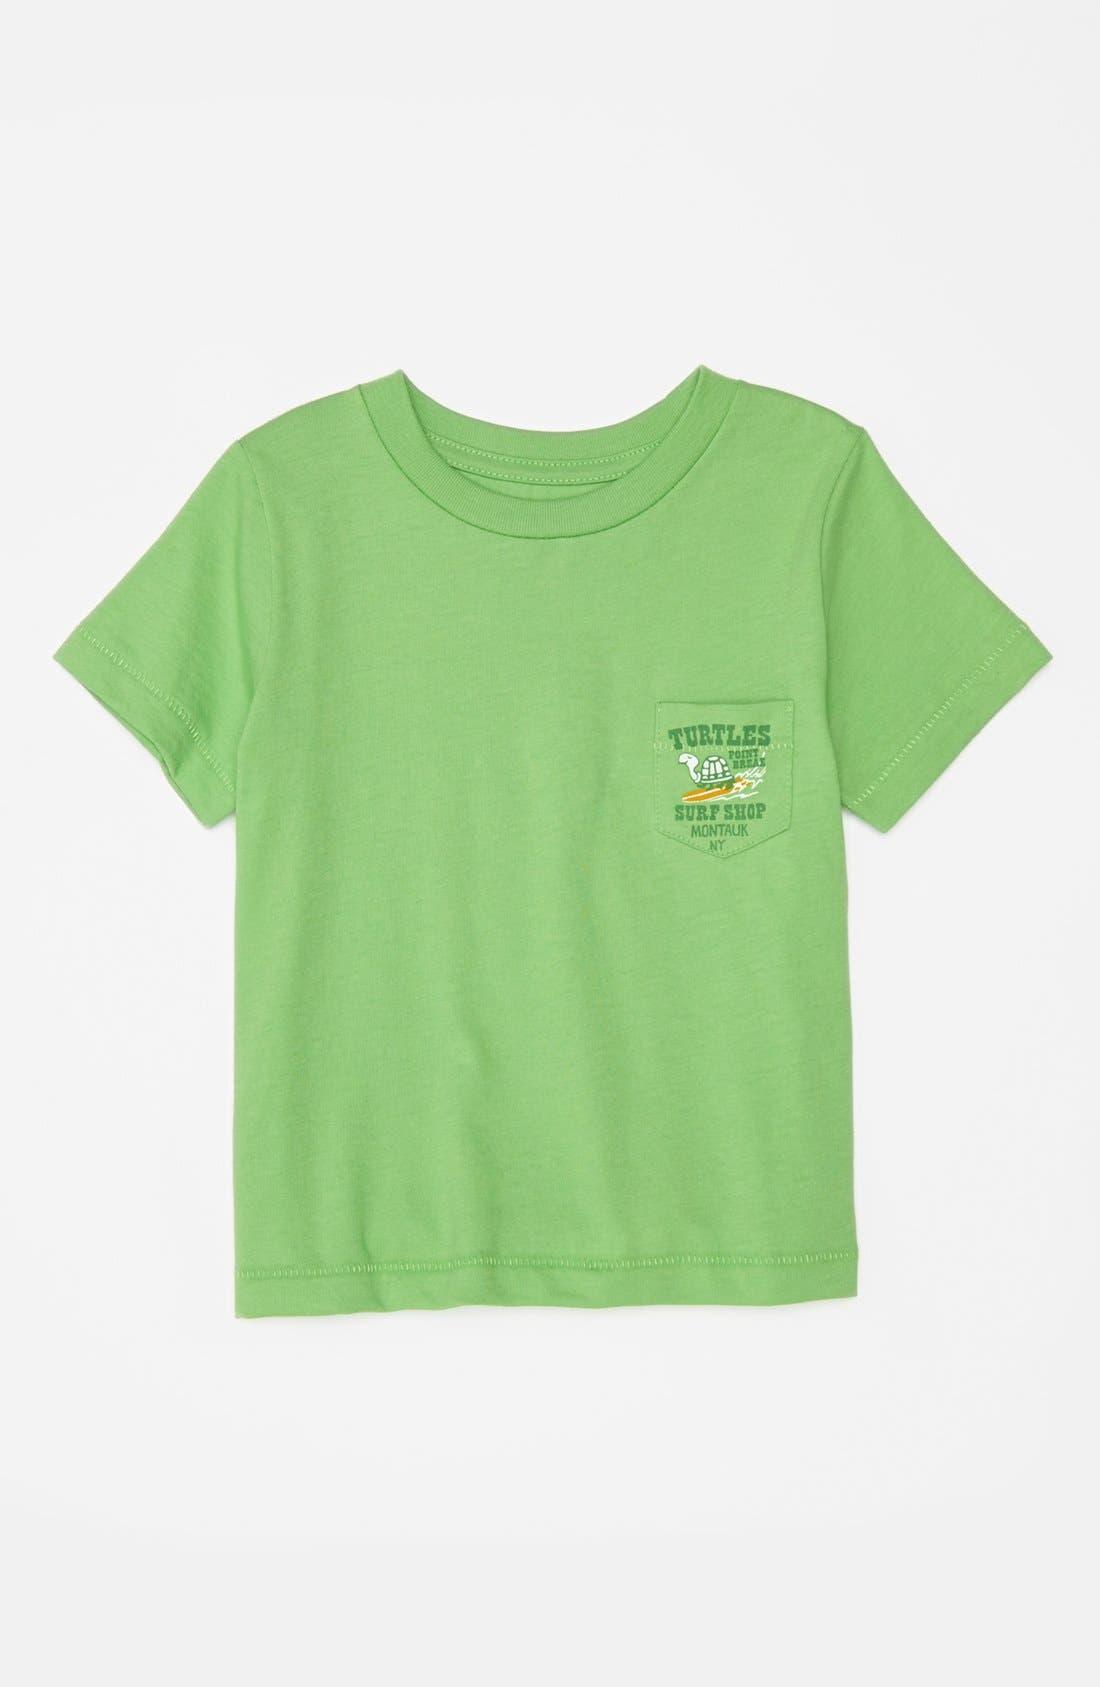 Alternate Image 1 Selected - Peek 'Turtle Point' T-Shirt (Baby Boys)